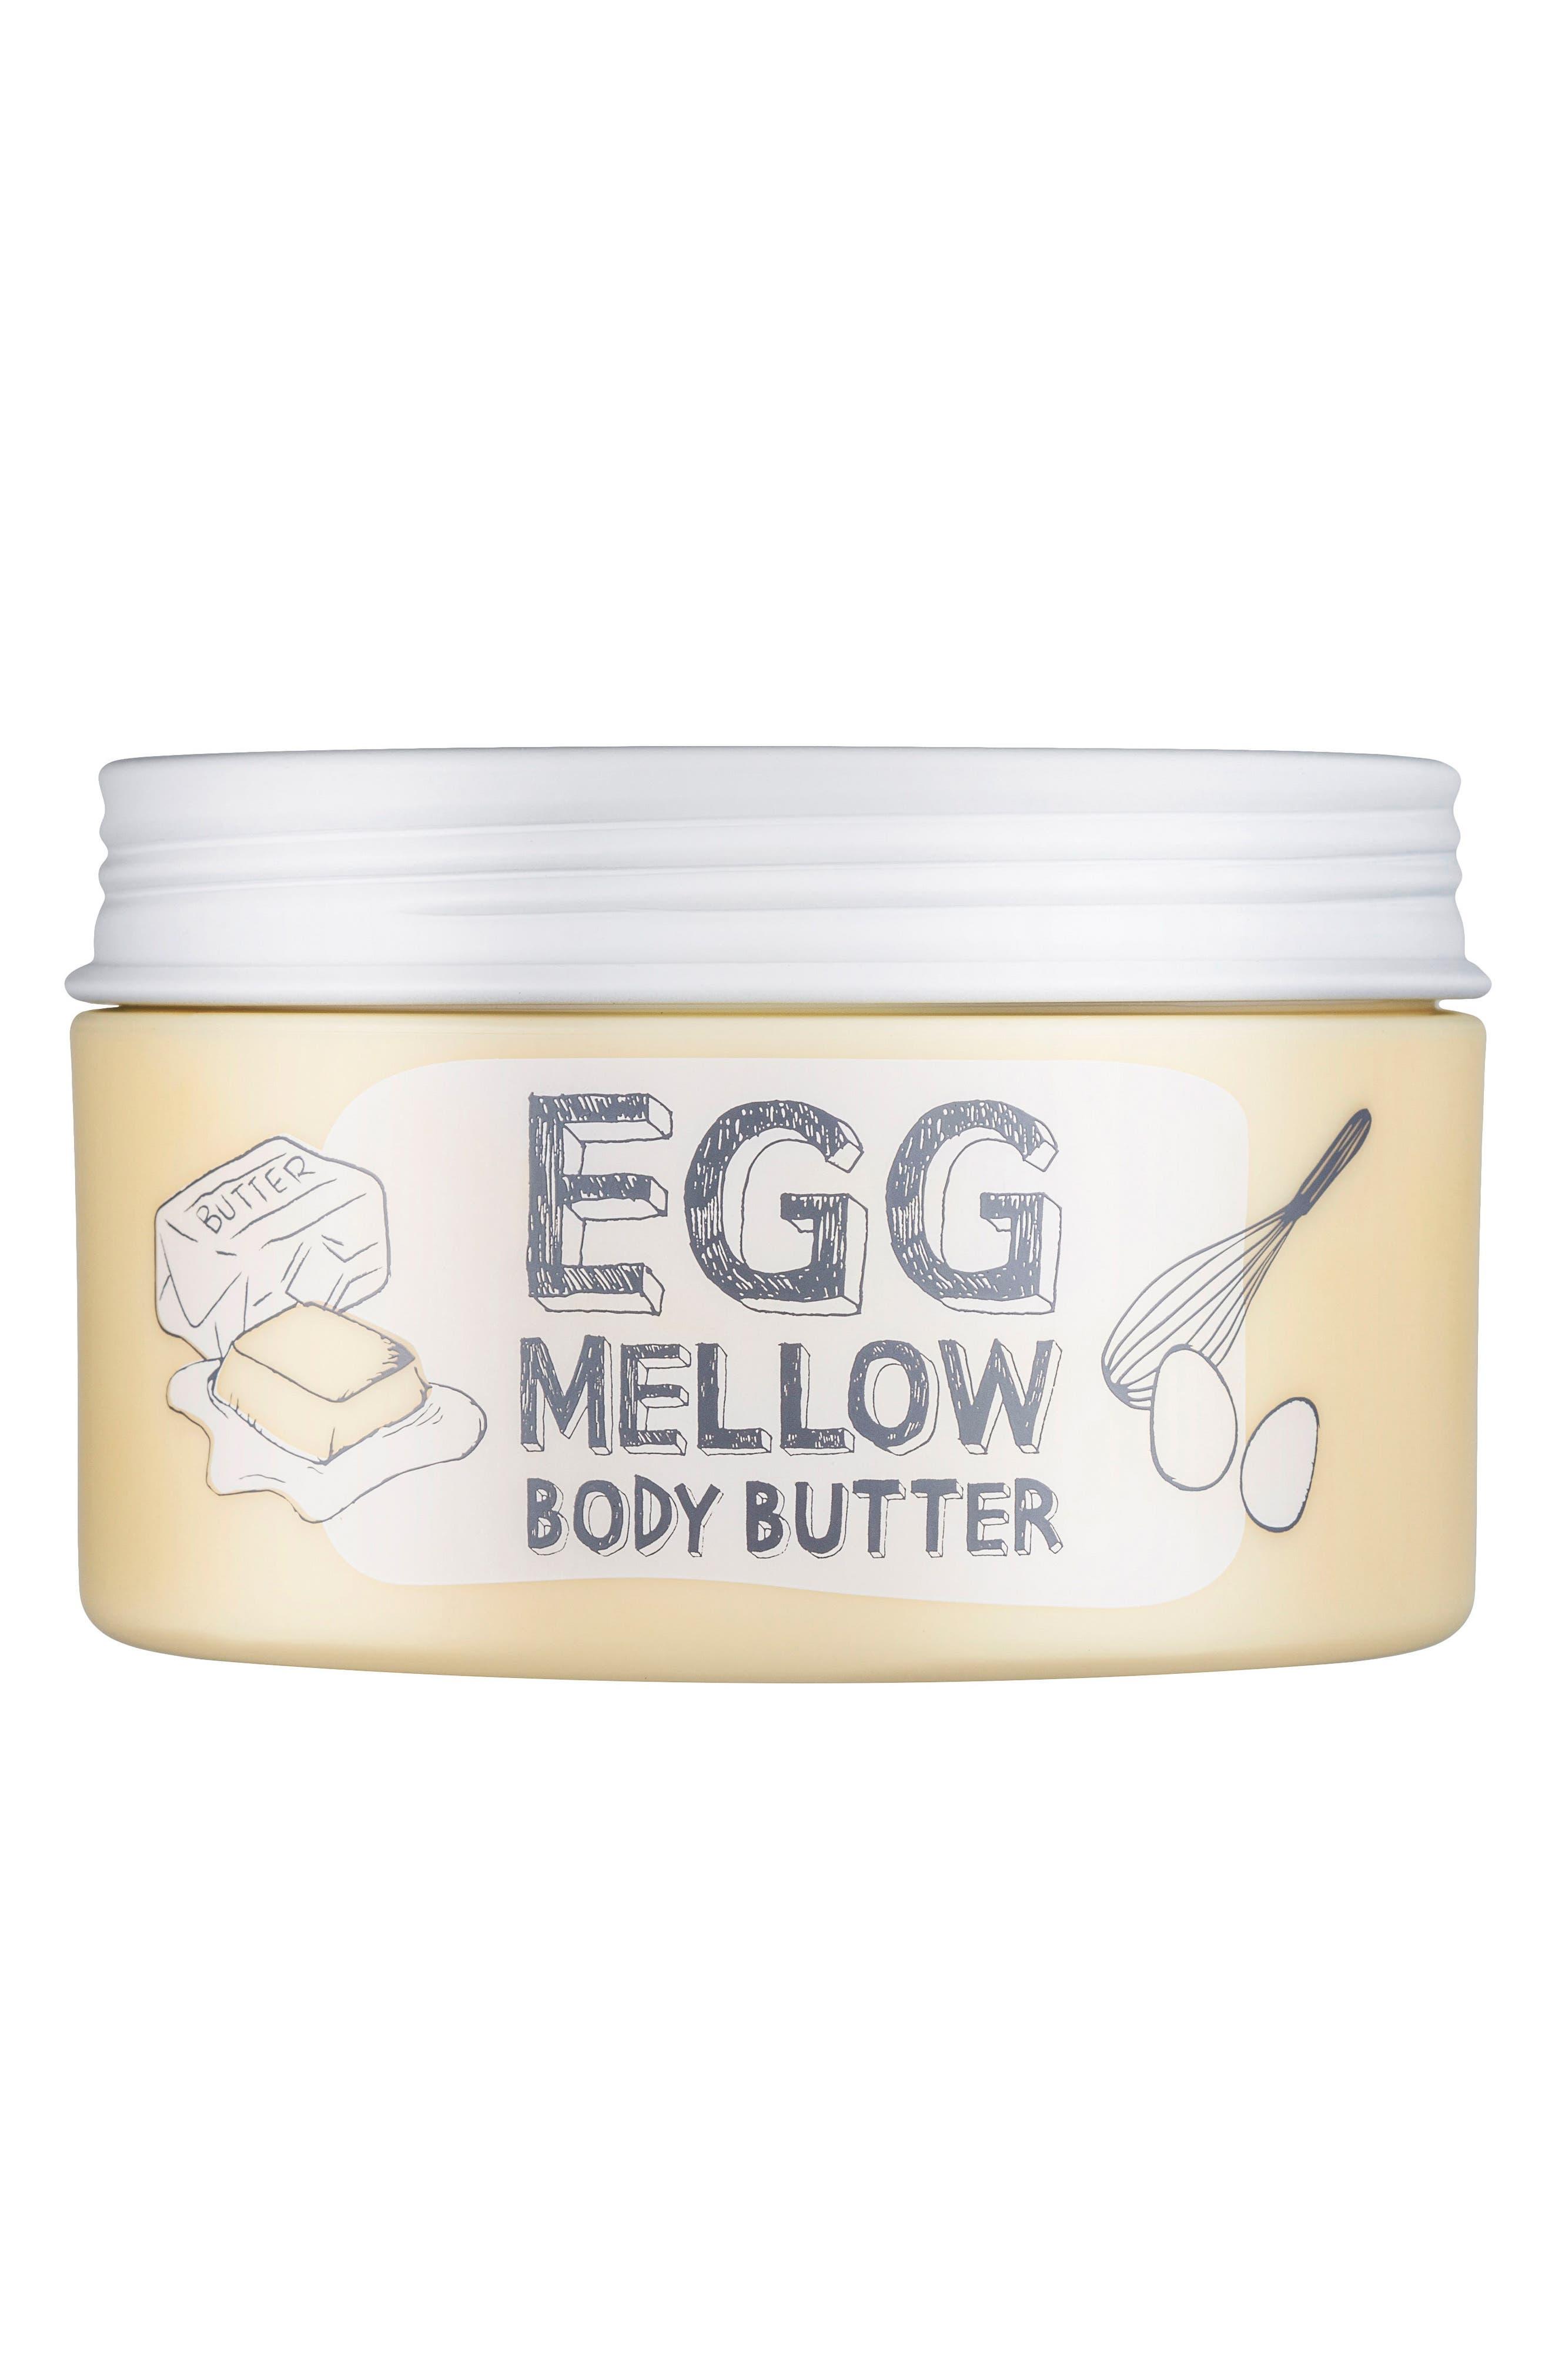 Egg Mellow Body Butter,                         Main,                         color, None